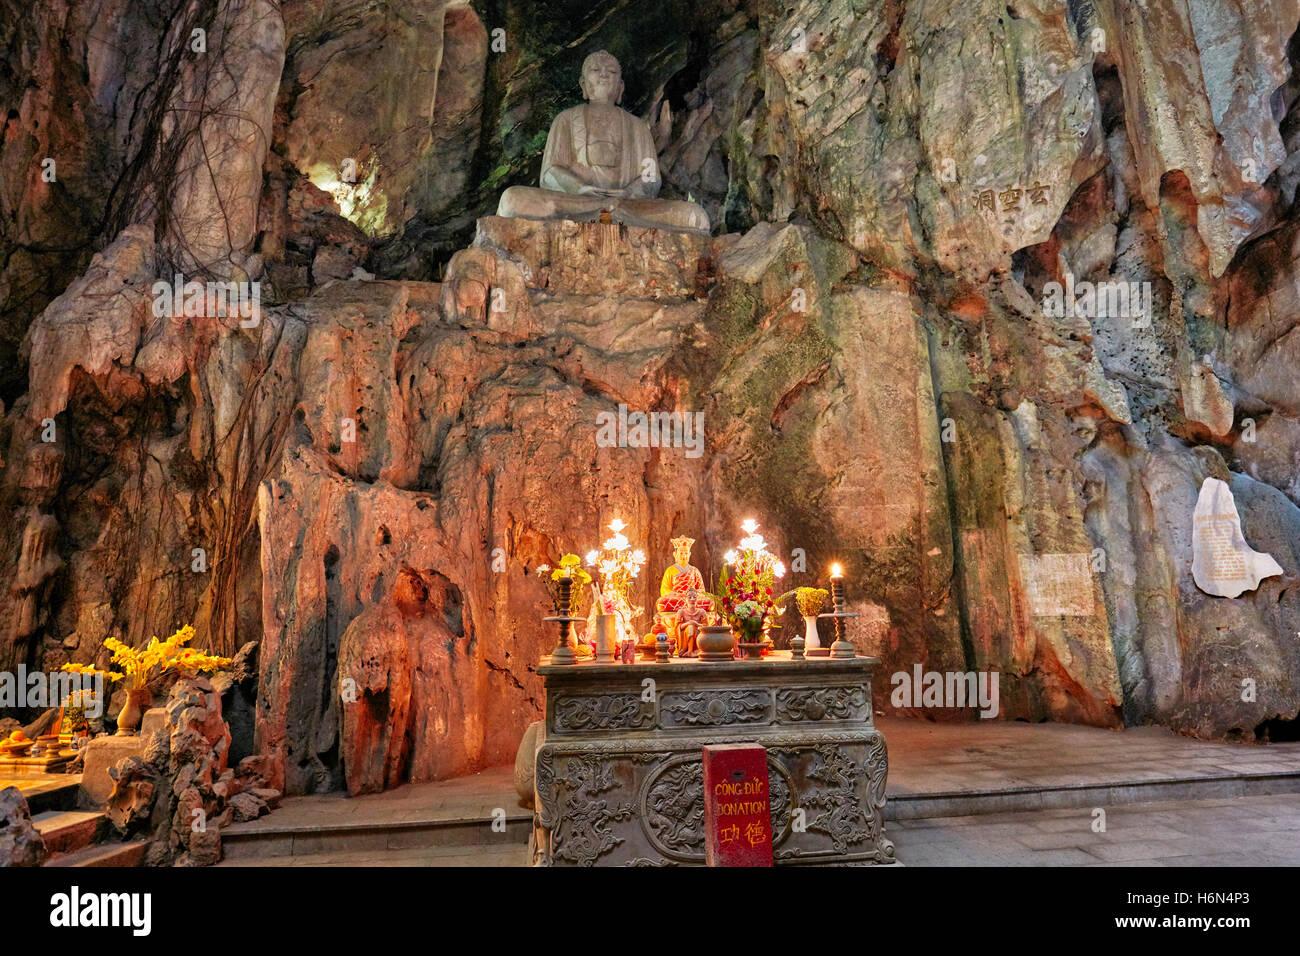 Huyen Khong Cave. Thuy Son Mountain, The Marble Mountains, Da Nang, Vietnam. - Stock Image